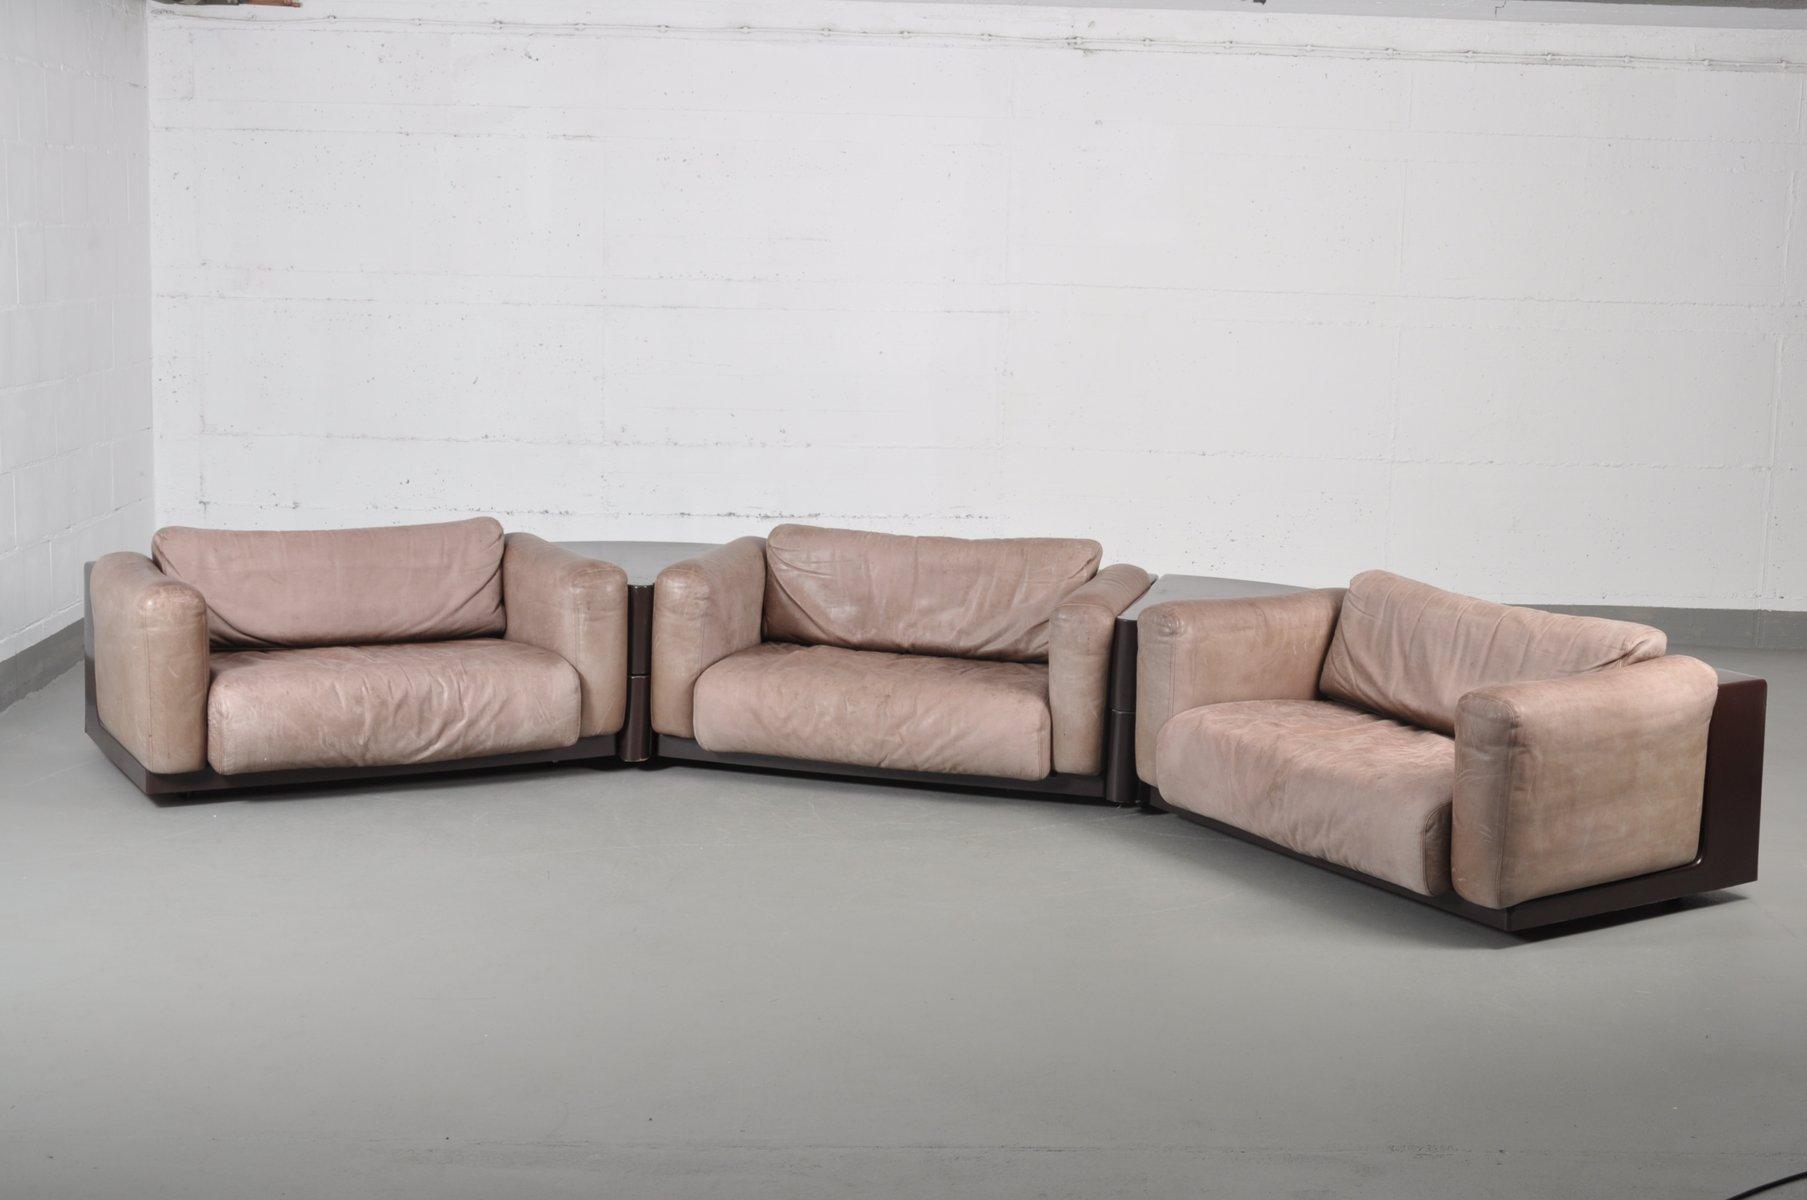 vintage modular sofa set bycini boeri for knoll bei pamono kaufen. Black Bedroom Furniture Sets. Home Design Ideas